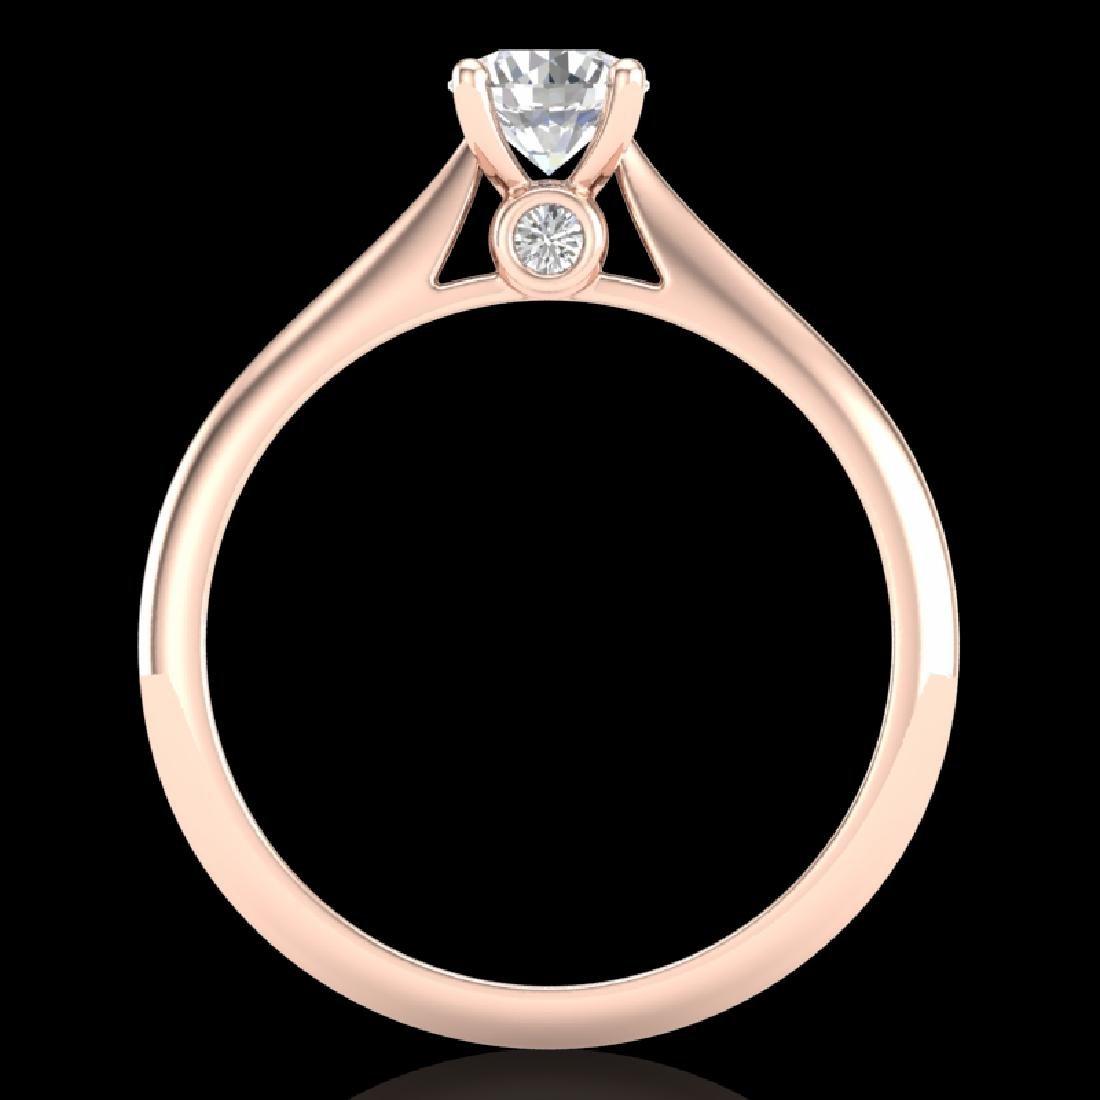 0.56 CTW VS/SI Diamond Solitaire Art Deco Ring 18K Rose - 3